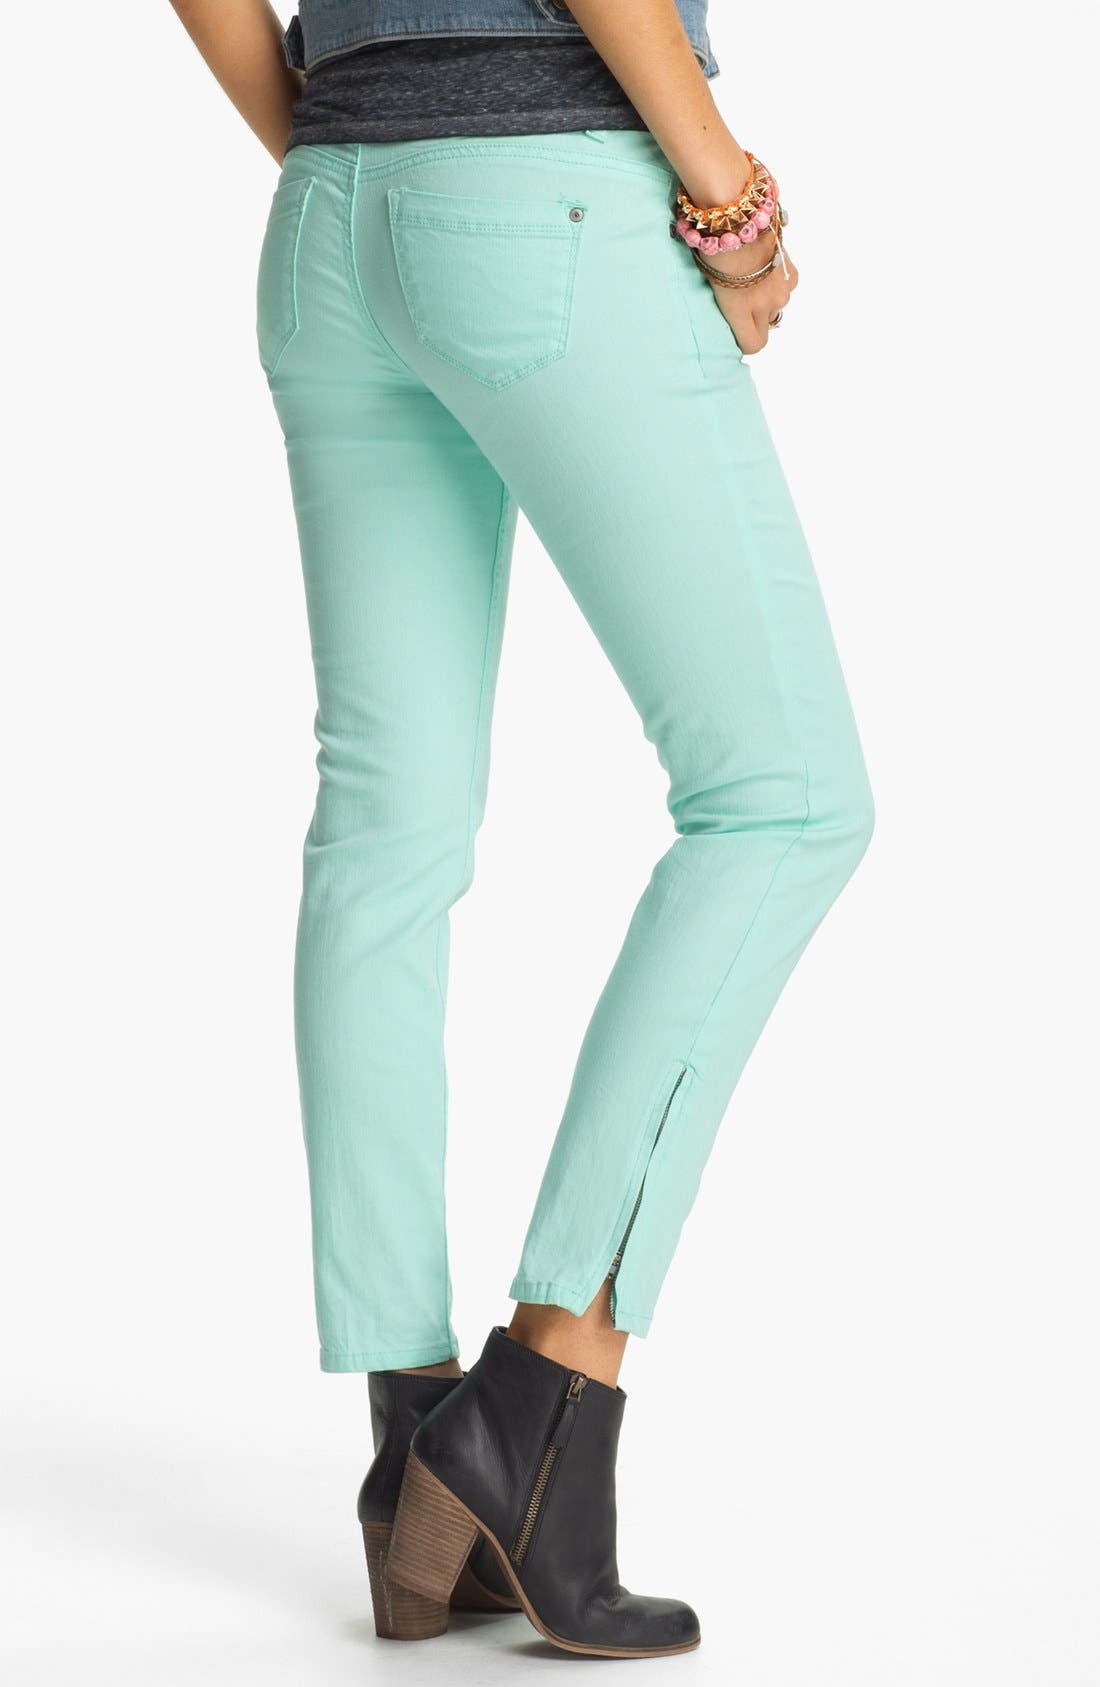 JOLT Ankle Zip Skinny Jeans, Main, color, 337